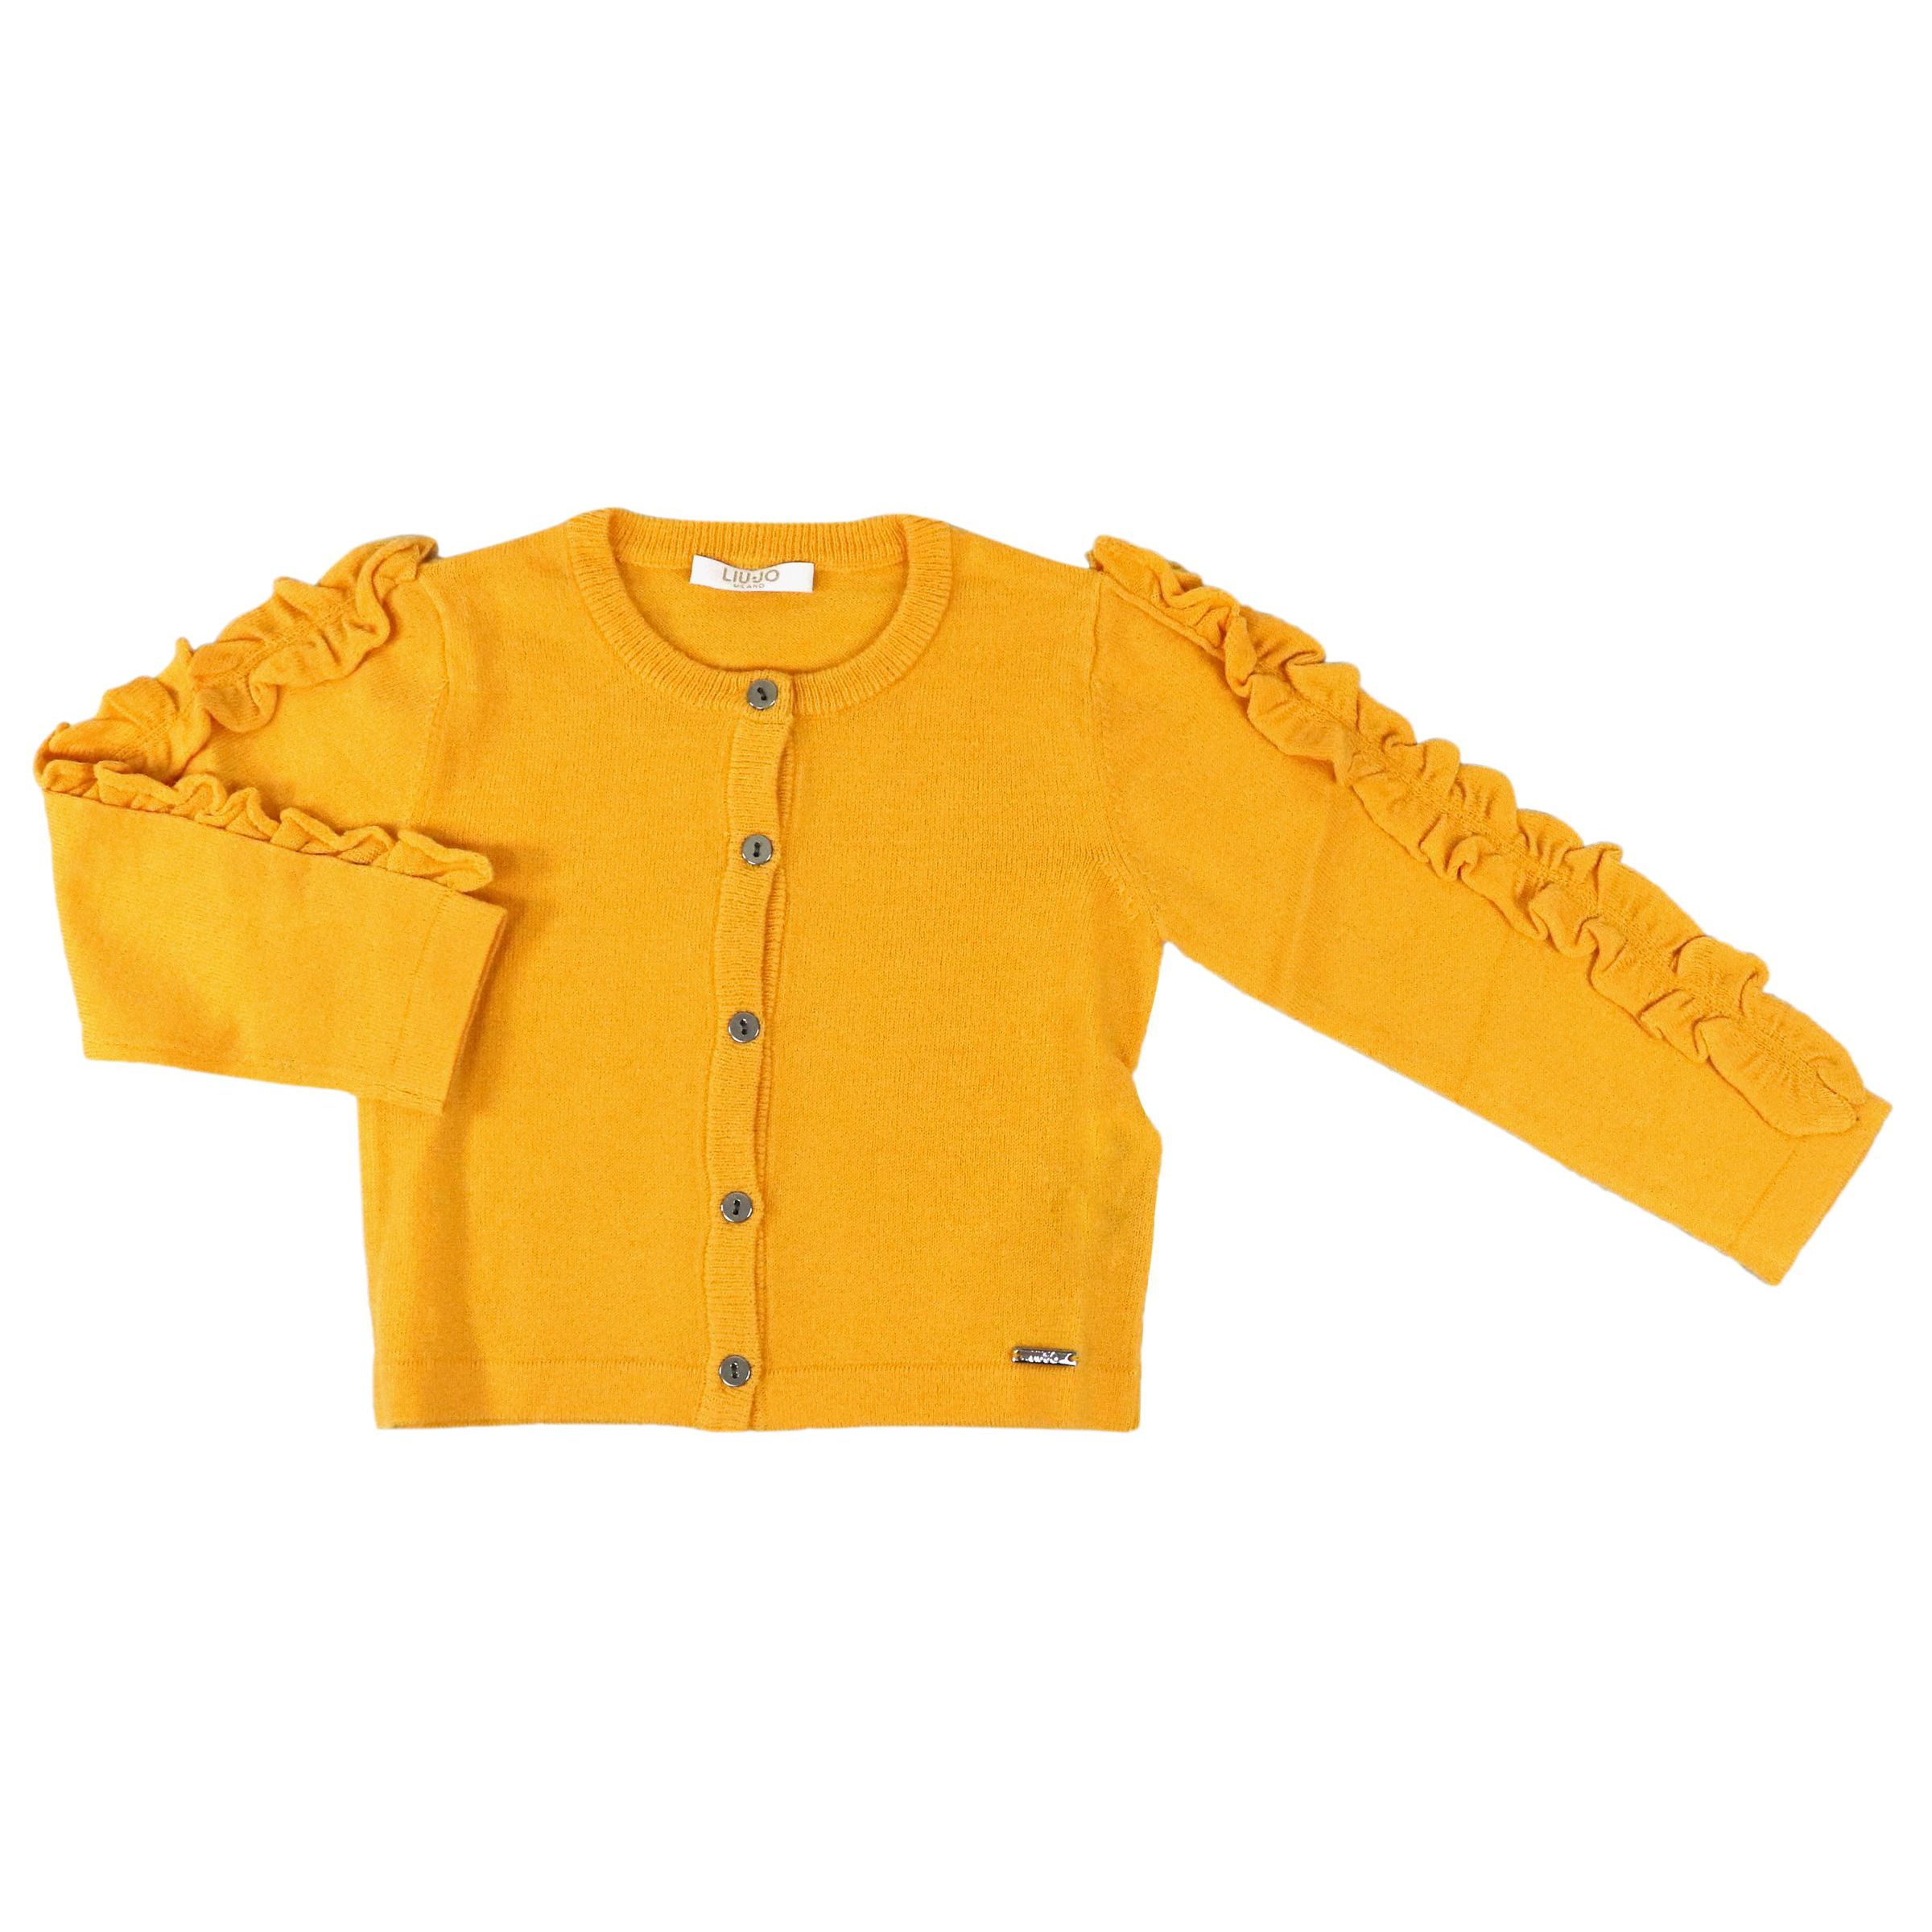 cheap for discount 72b09 b68bc Cardigan in misto lana con rouches sulle maniche